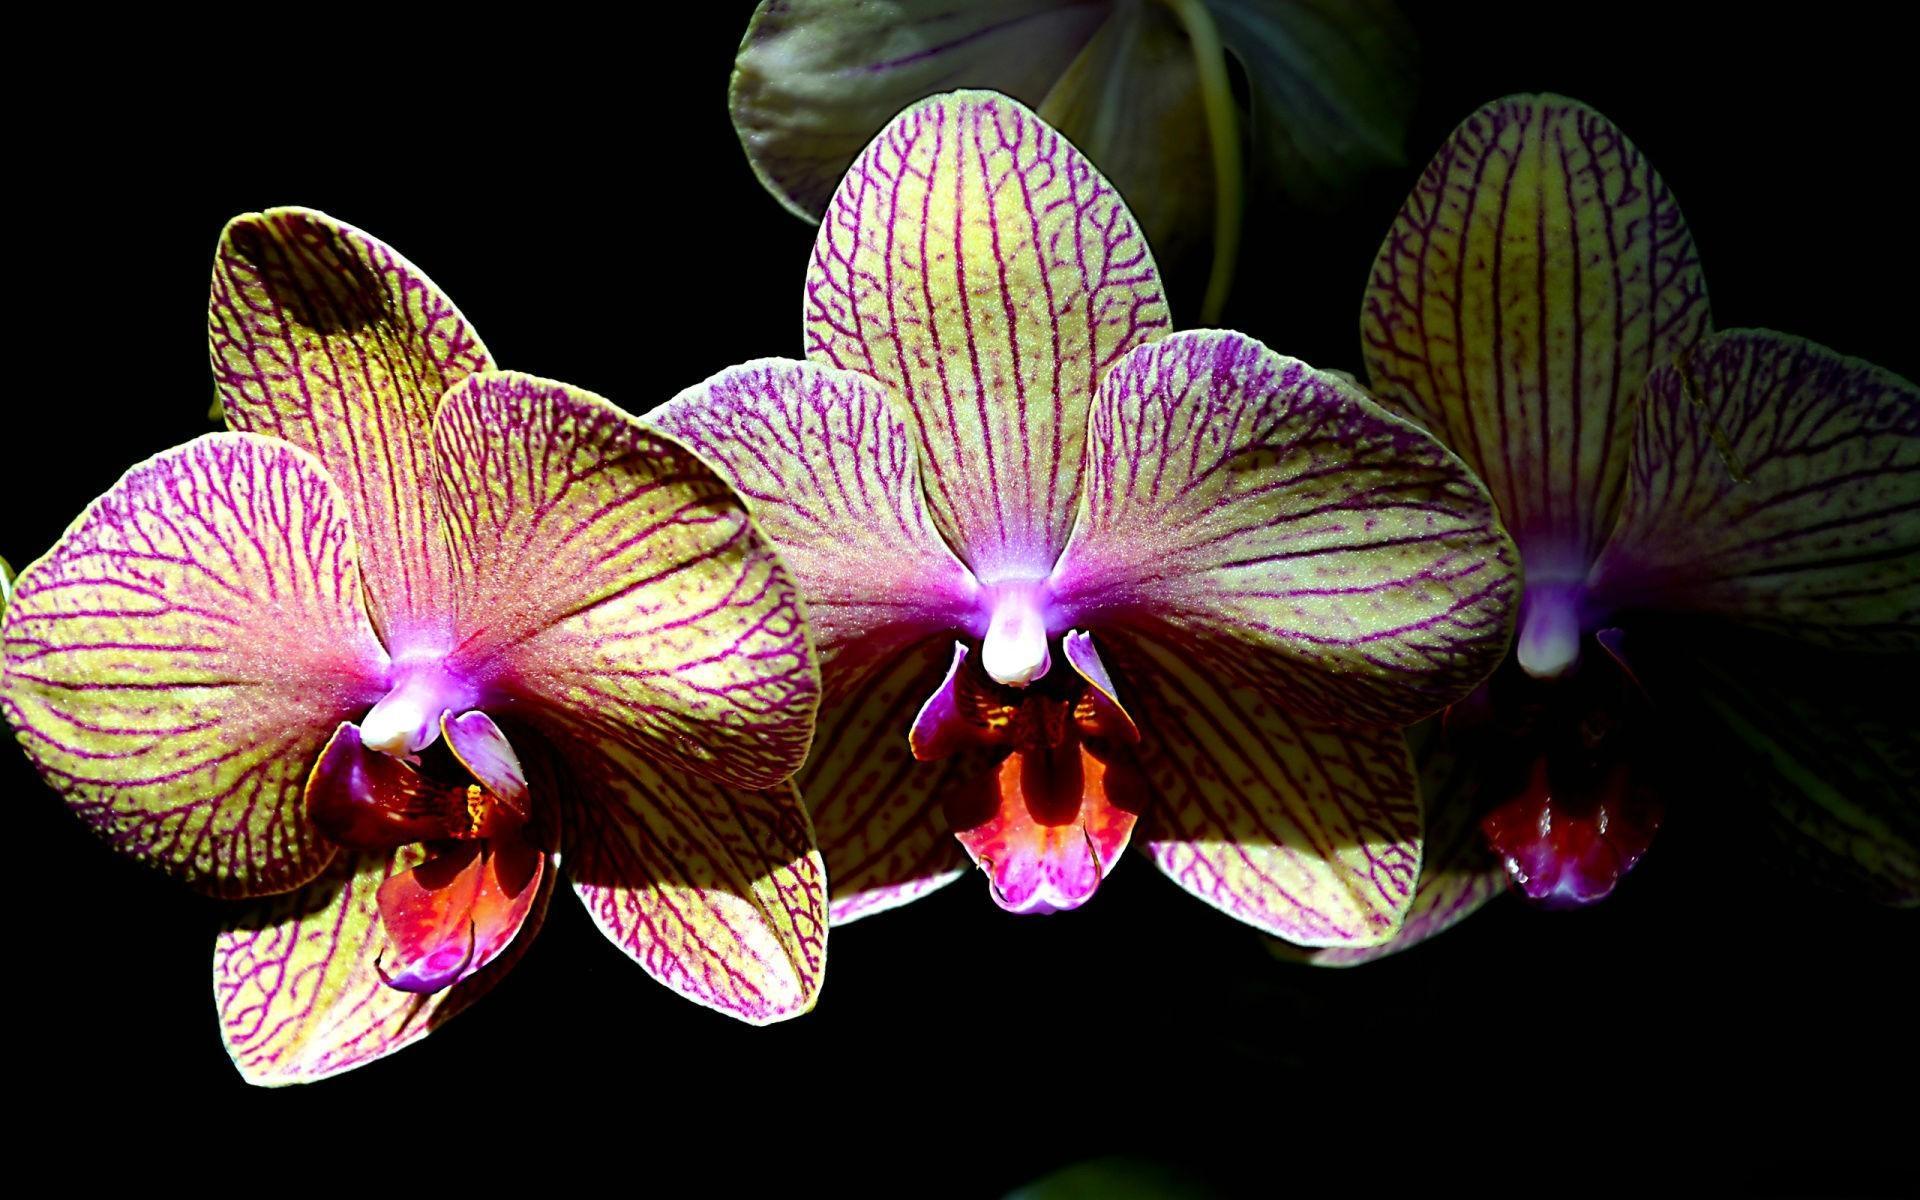 Shenzhen Nongke Orchid Download